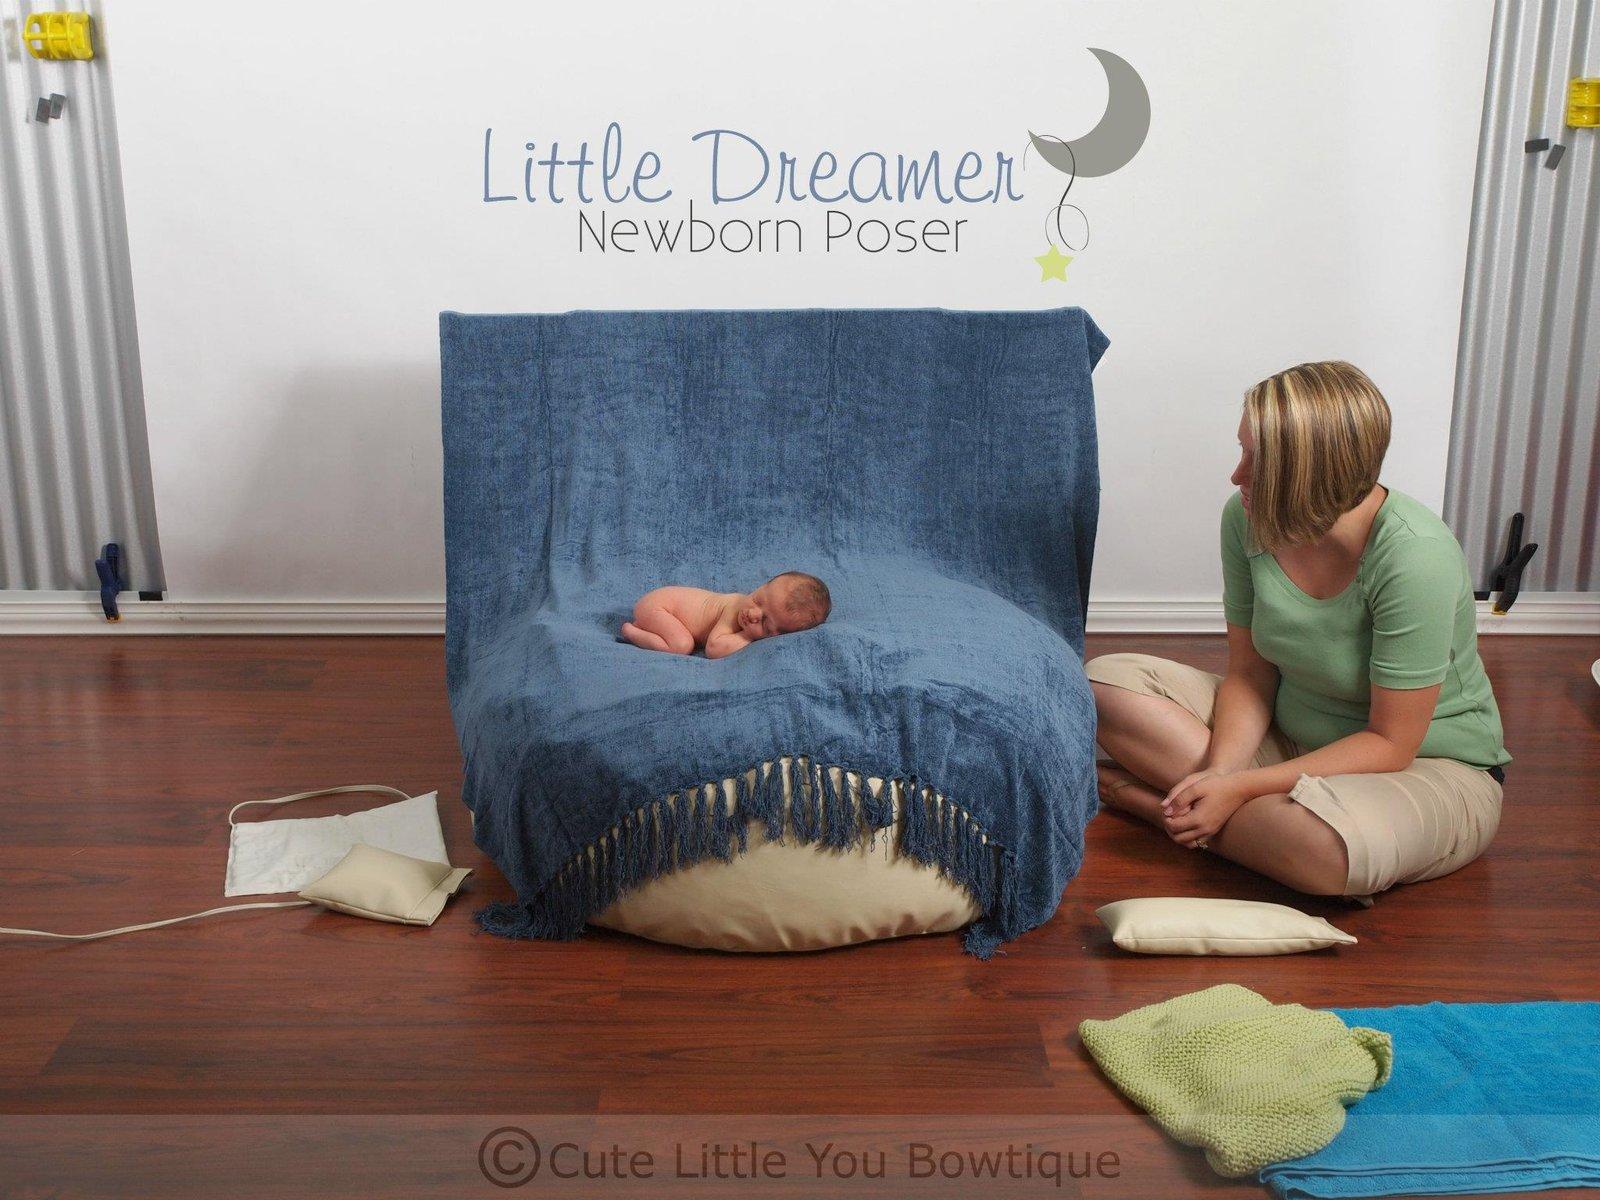 Image of newborn poser starter set